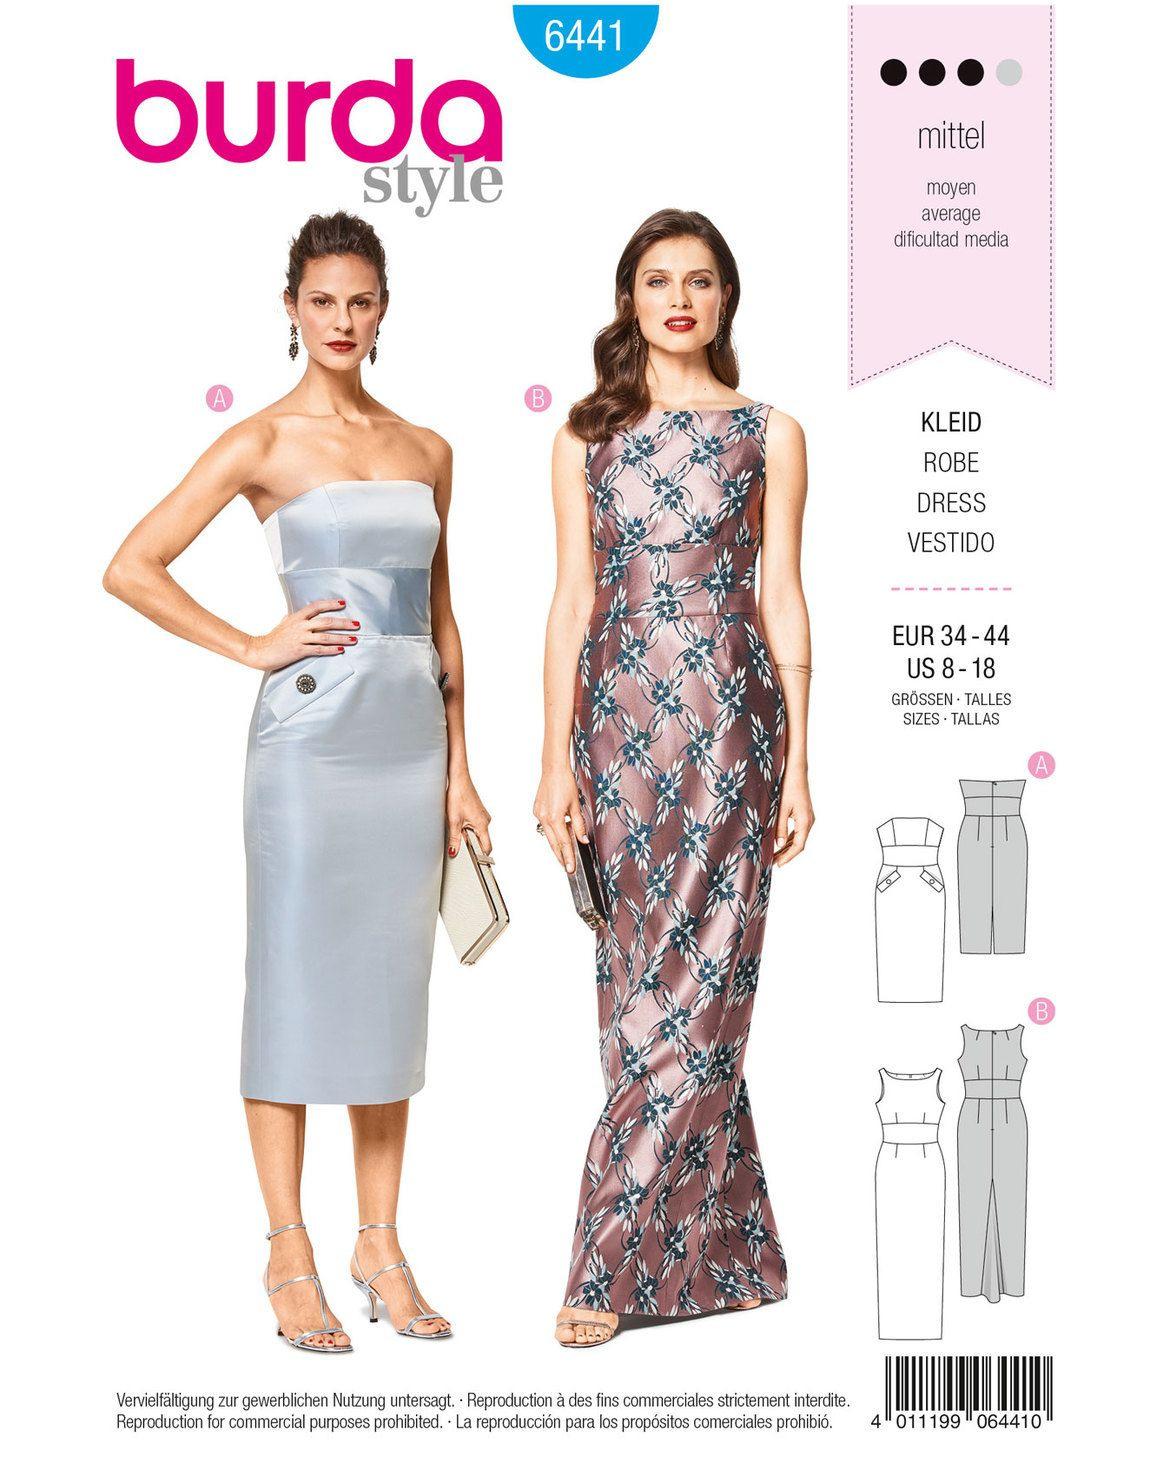 20 Kreativ Abendkleid Selber Nähen BoutiqueAbend Top Abendkleid Selber Nähen Ärmel